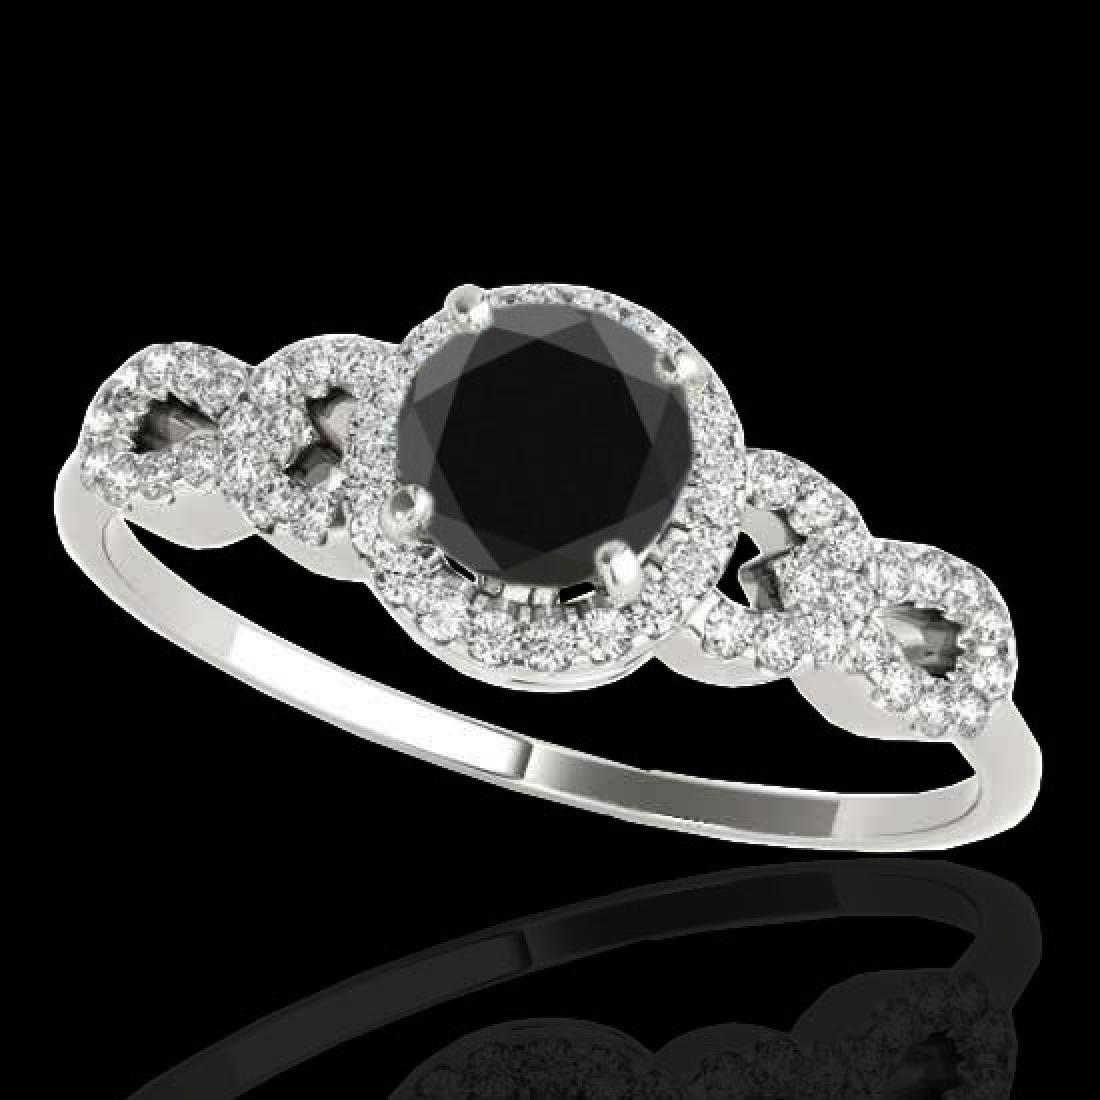 1.33 CTW Certified VS Black Diamond Solitaire Ring 10K